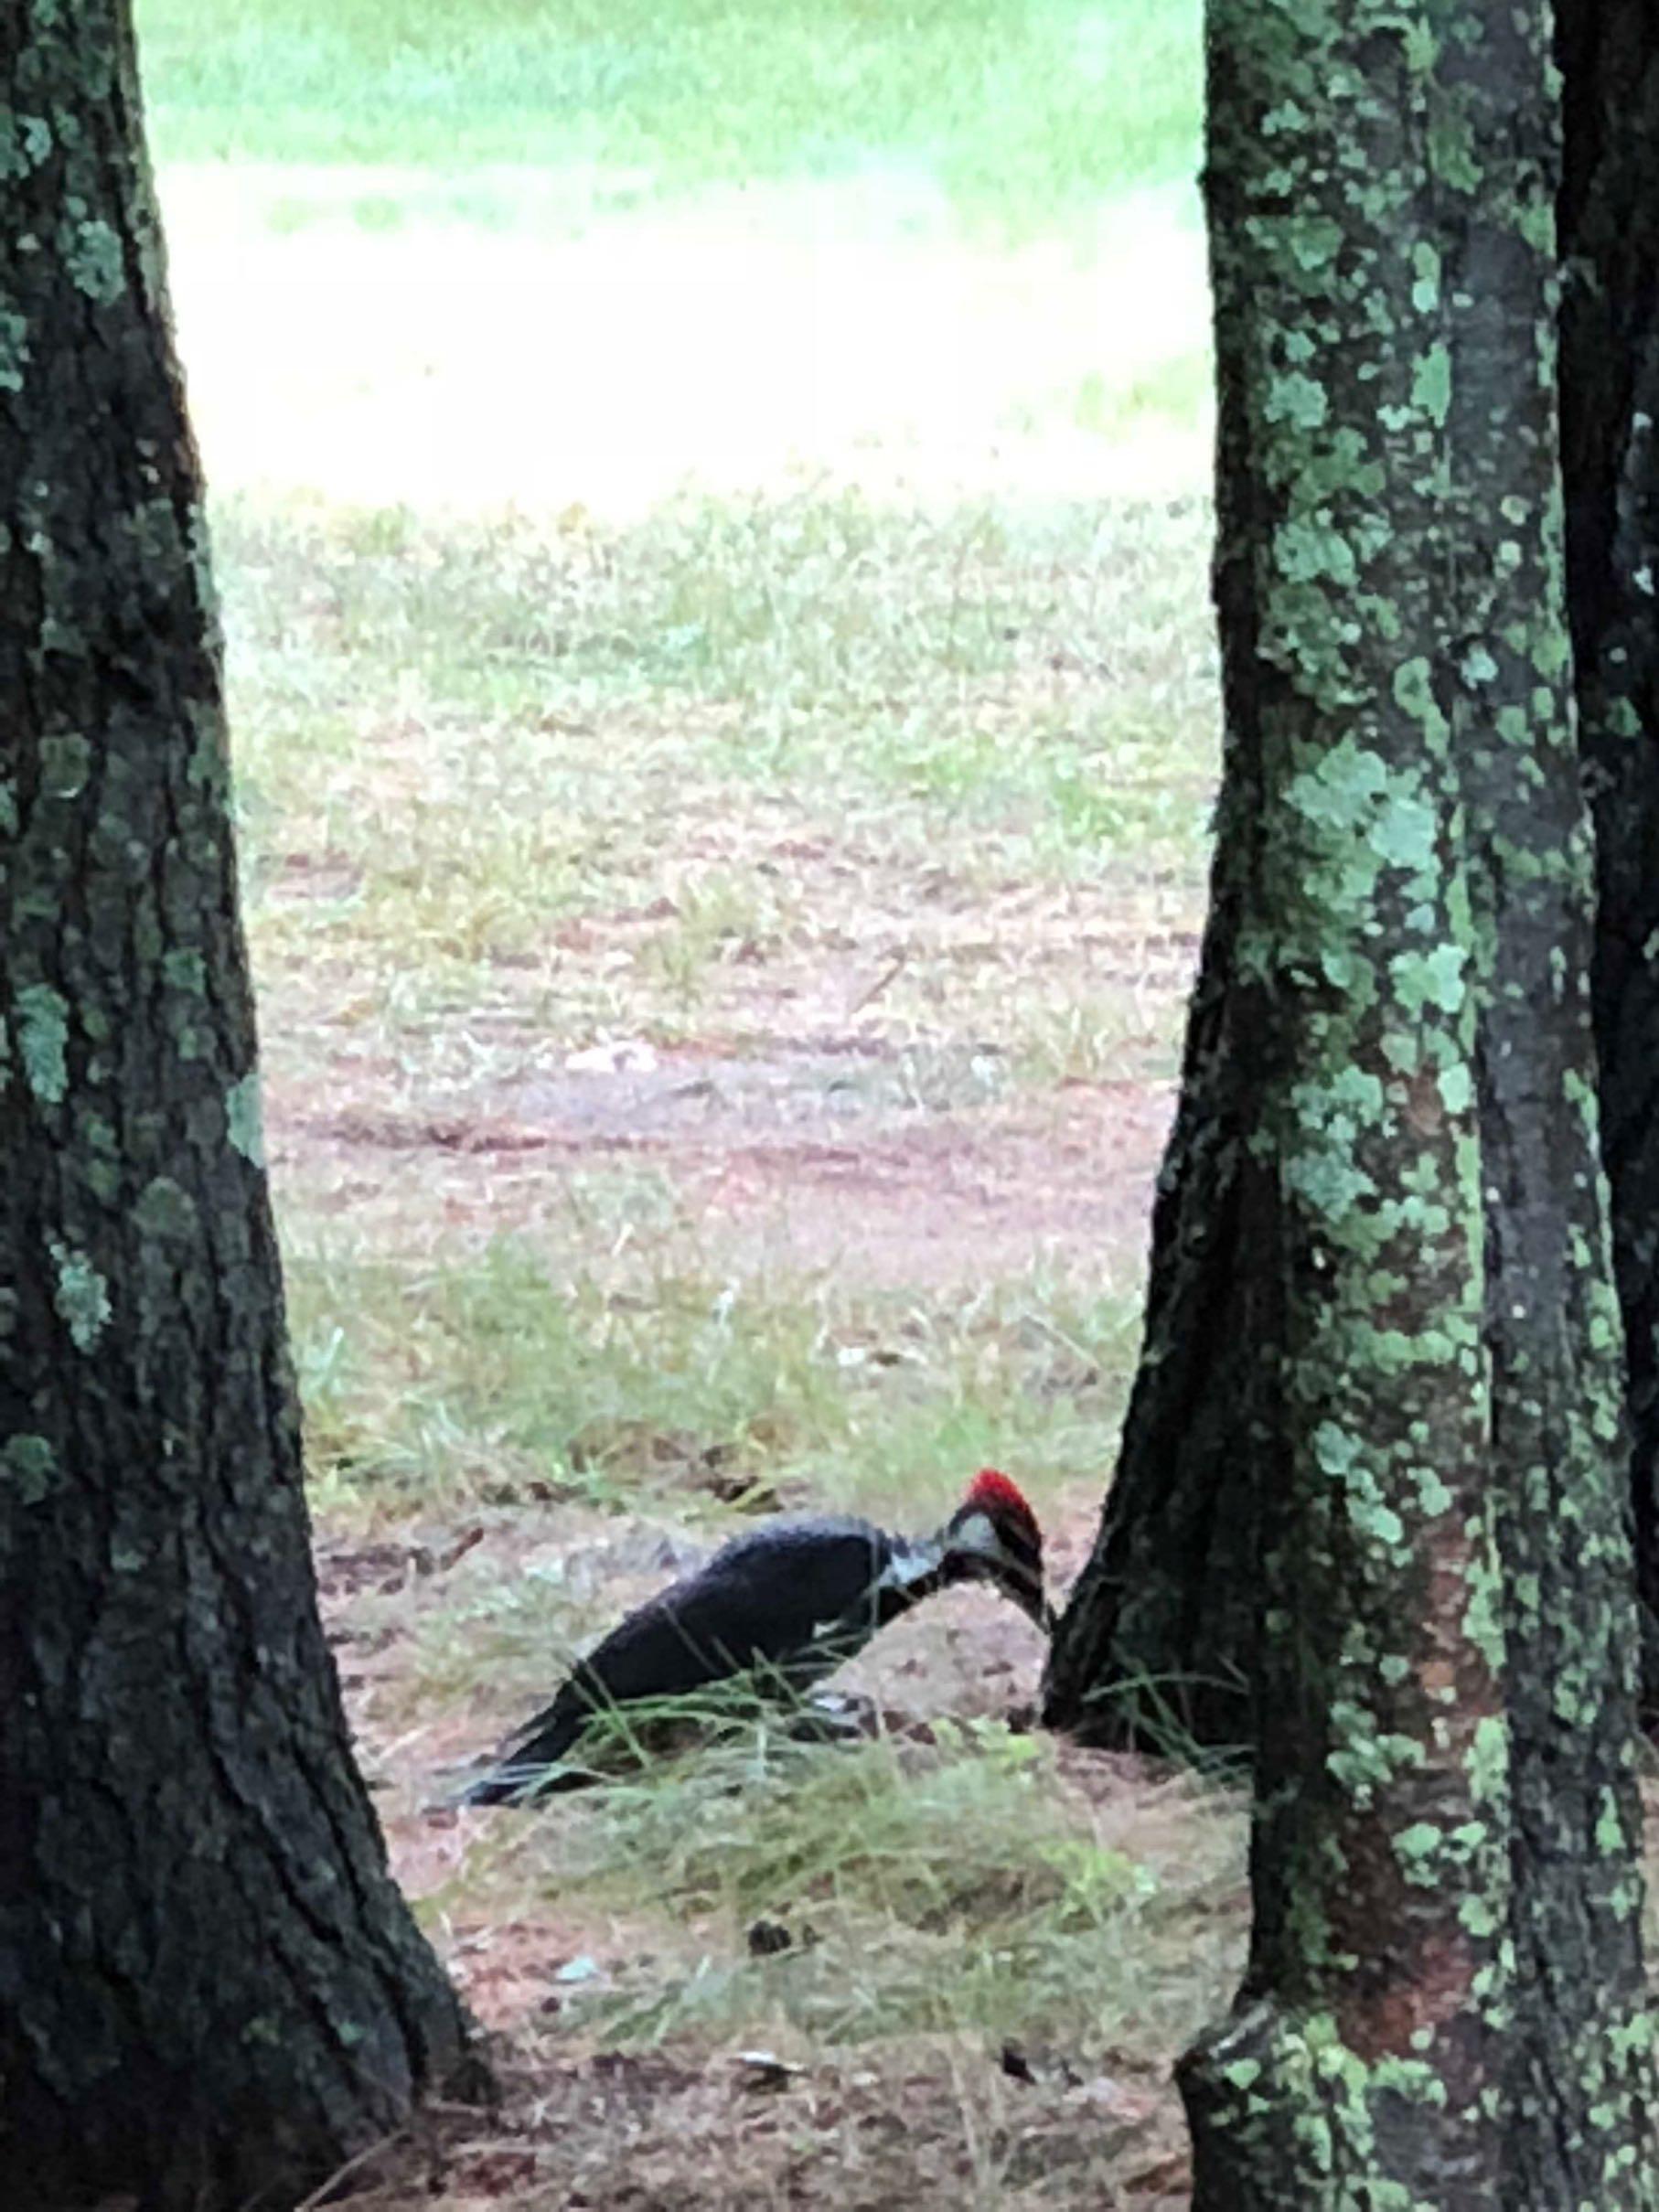 7pileatedwoodpecker